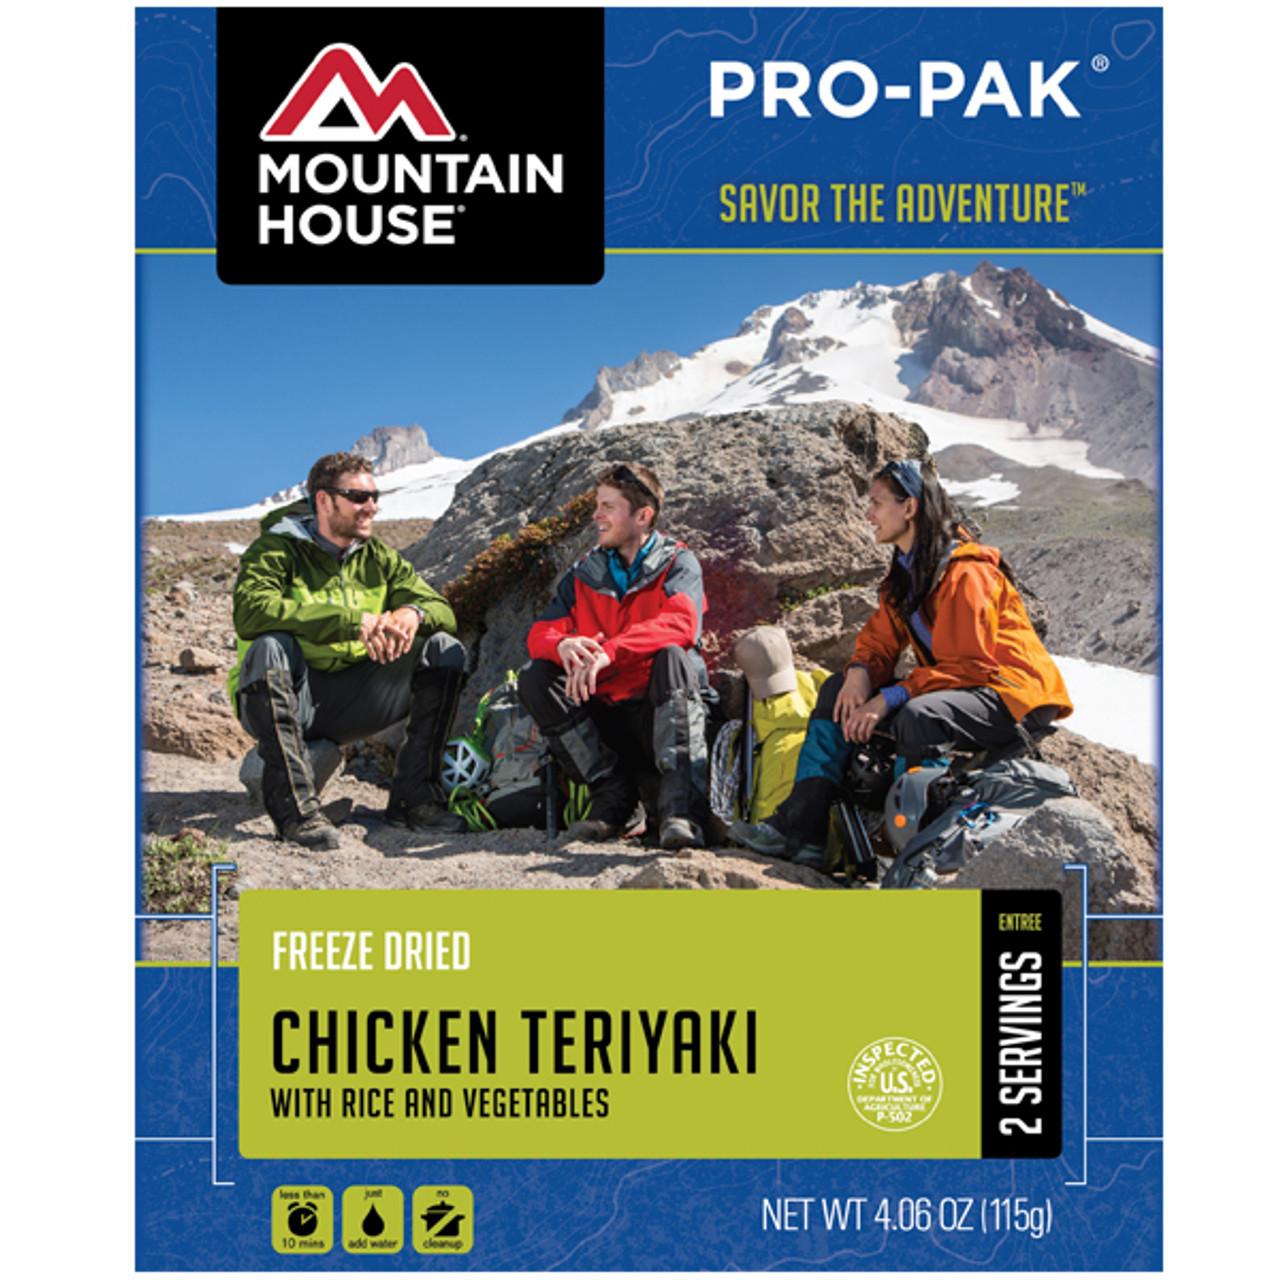 Mountain House Chicken Teriyaki Pro-Pak Pouch